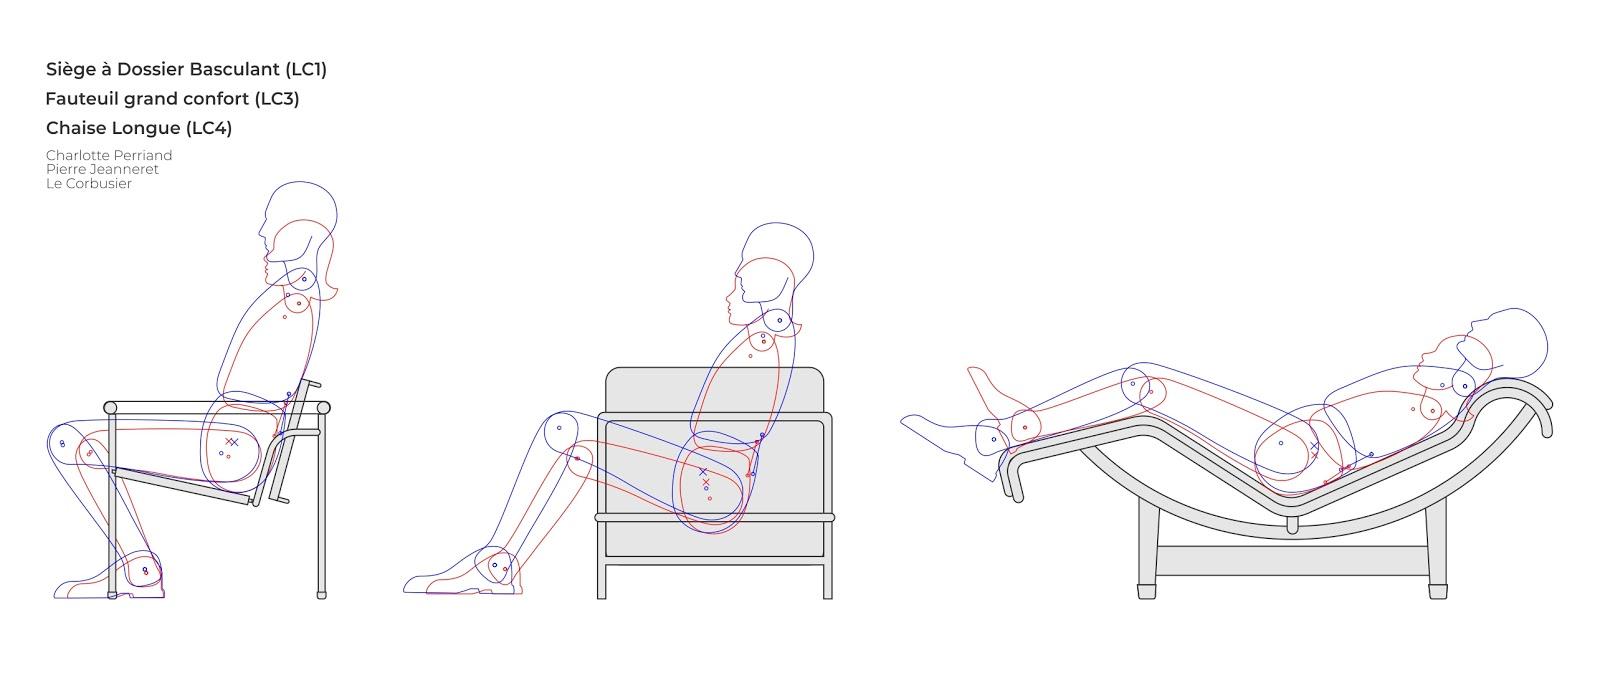 chaiselongue wikipedia The iconic ergonomics exploration u2013 Siège à Dossier Basculant, Fauteuil  grand confort and Chaise Longue